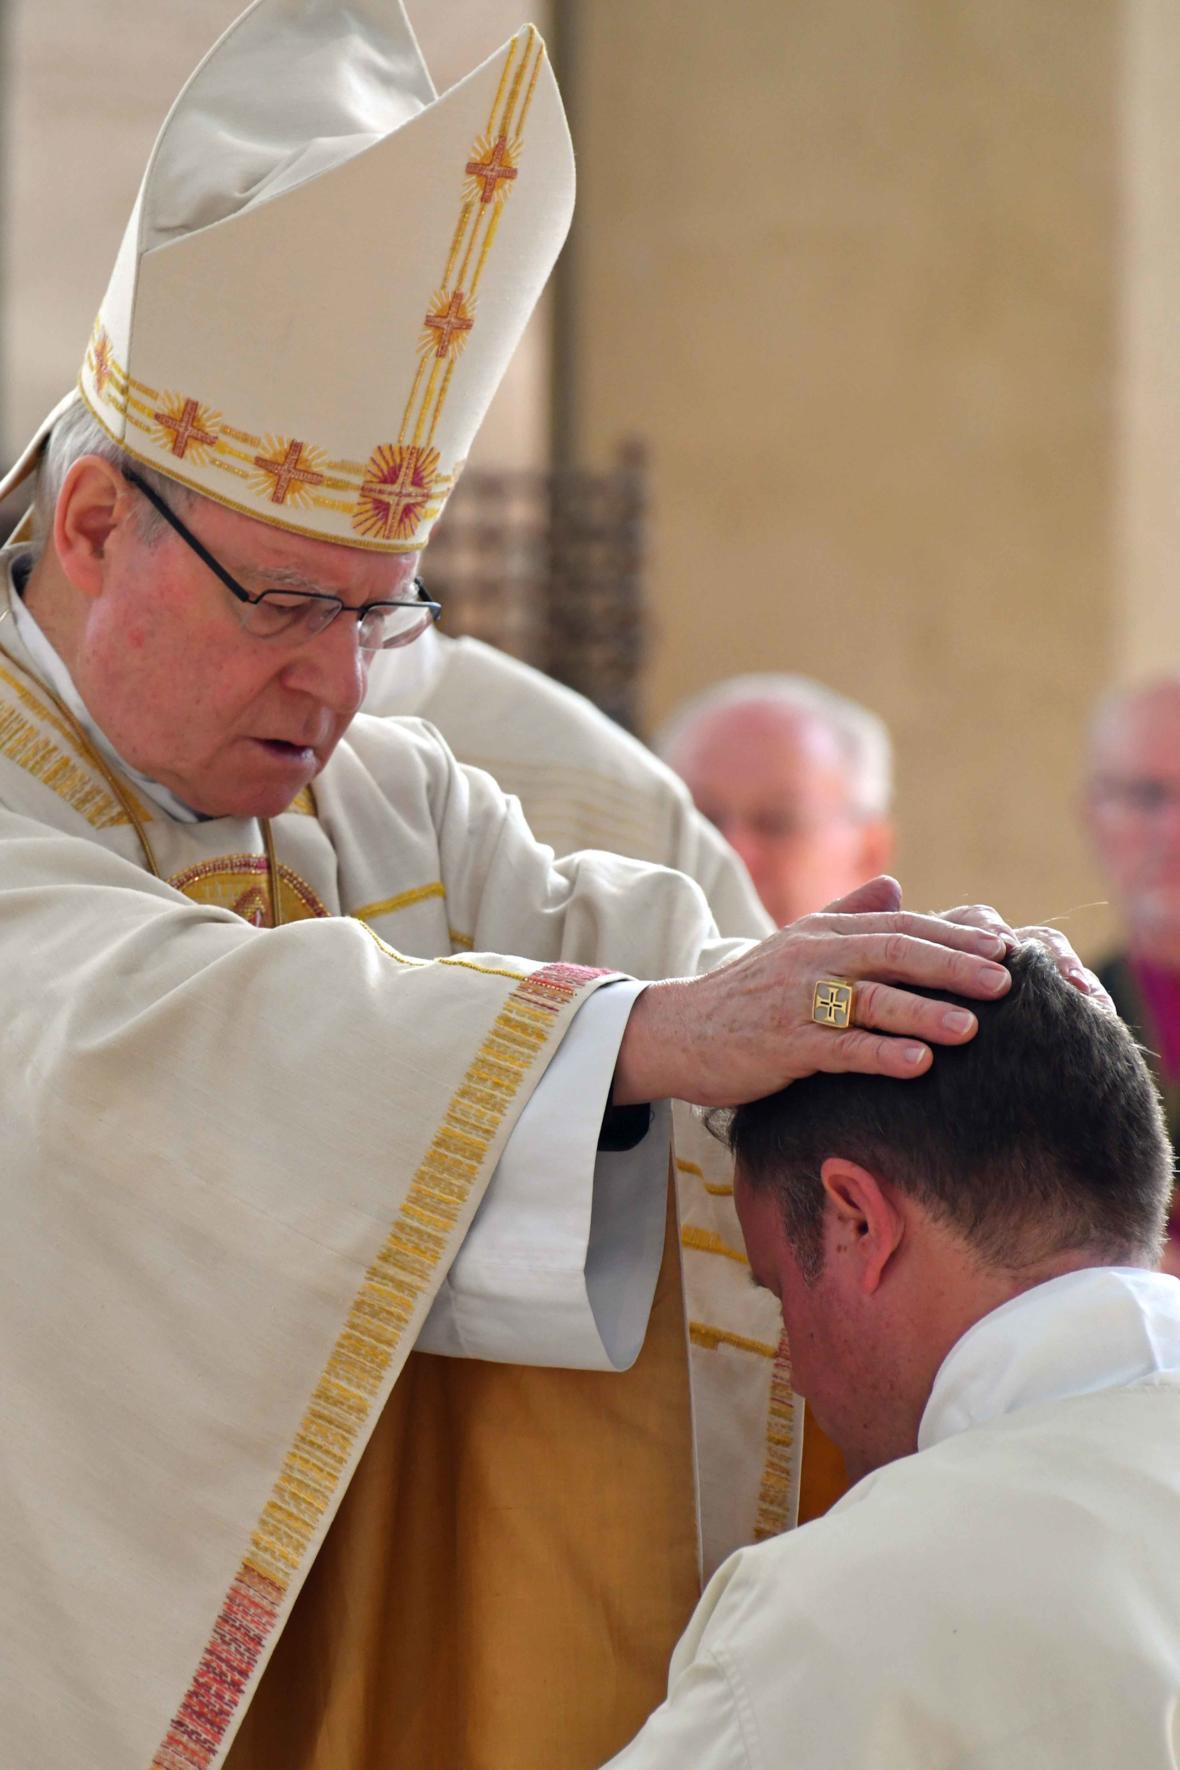 Weihe Ständiger Diakonat 2018_Handauflegung des Bischofs bei Diakon Franz Eduard Schmidt aus Königsbrunn (Foto_Nicolas Schnall_pba)